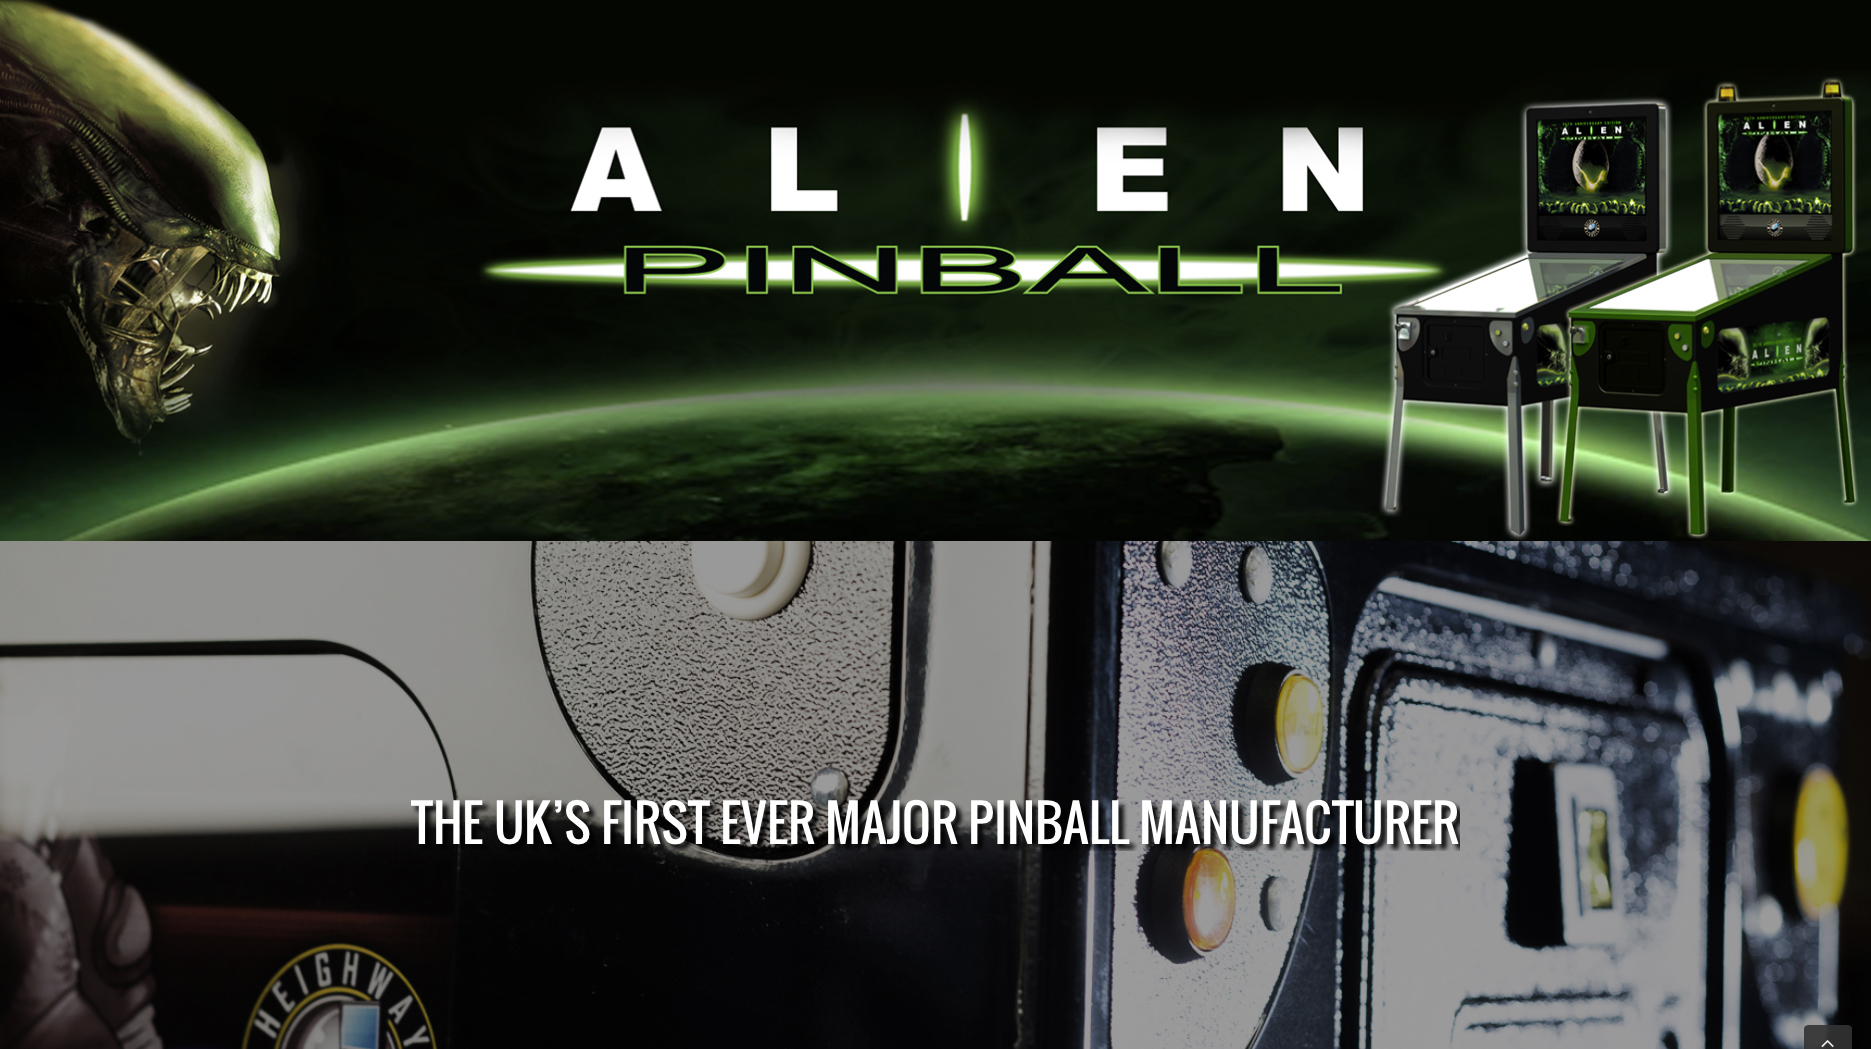 Alien Pinball web design for Heighway Pinball